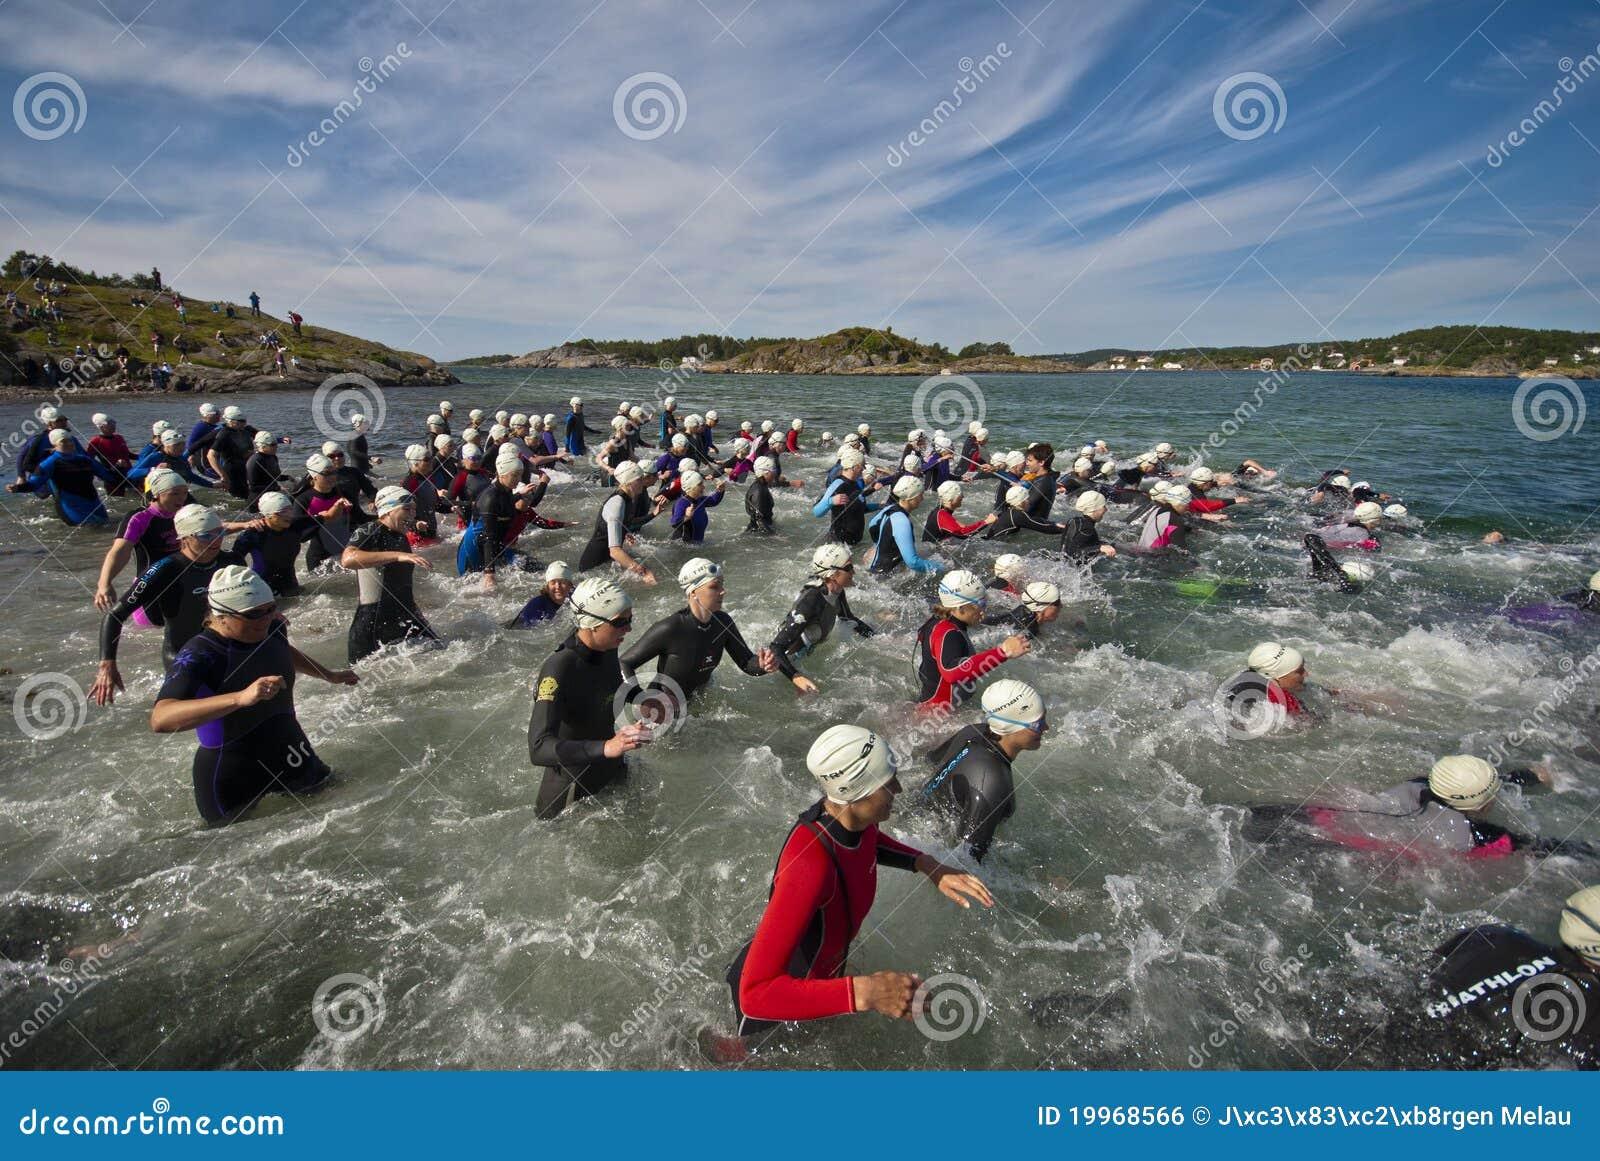 Hove triathlon